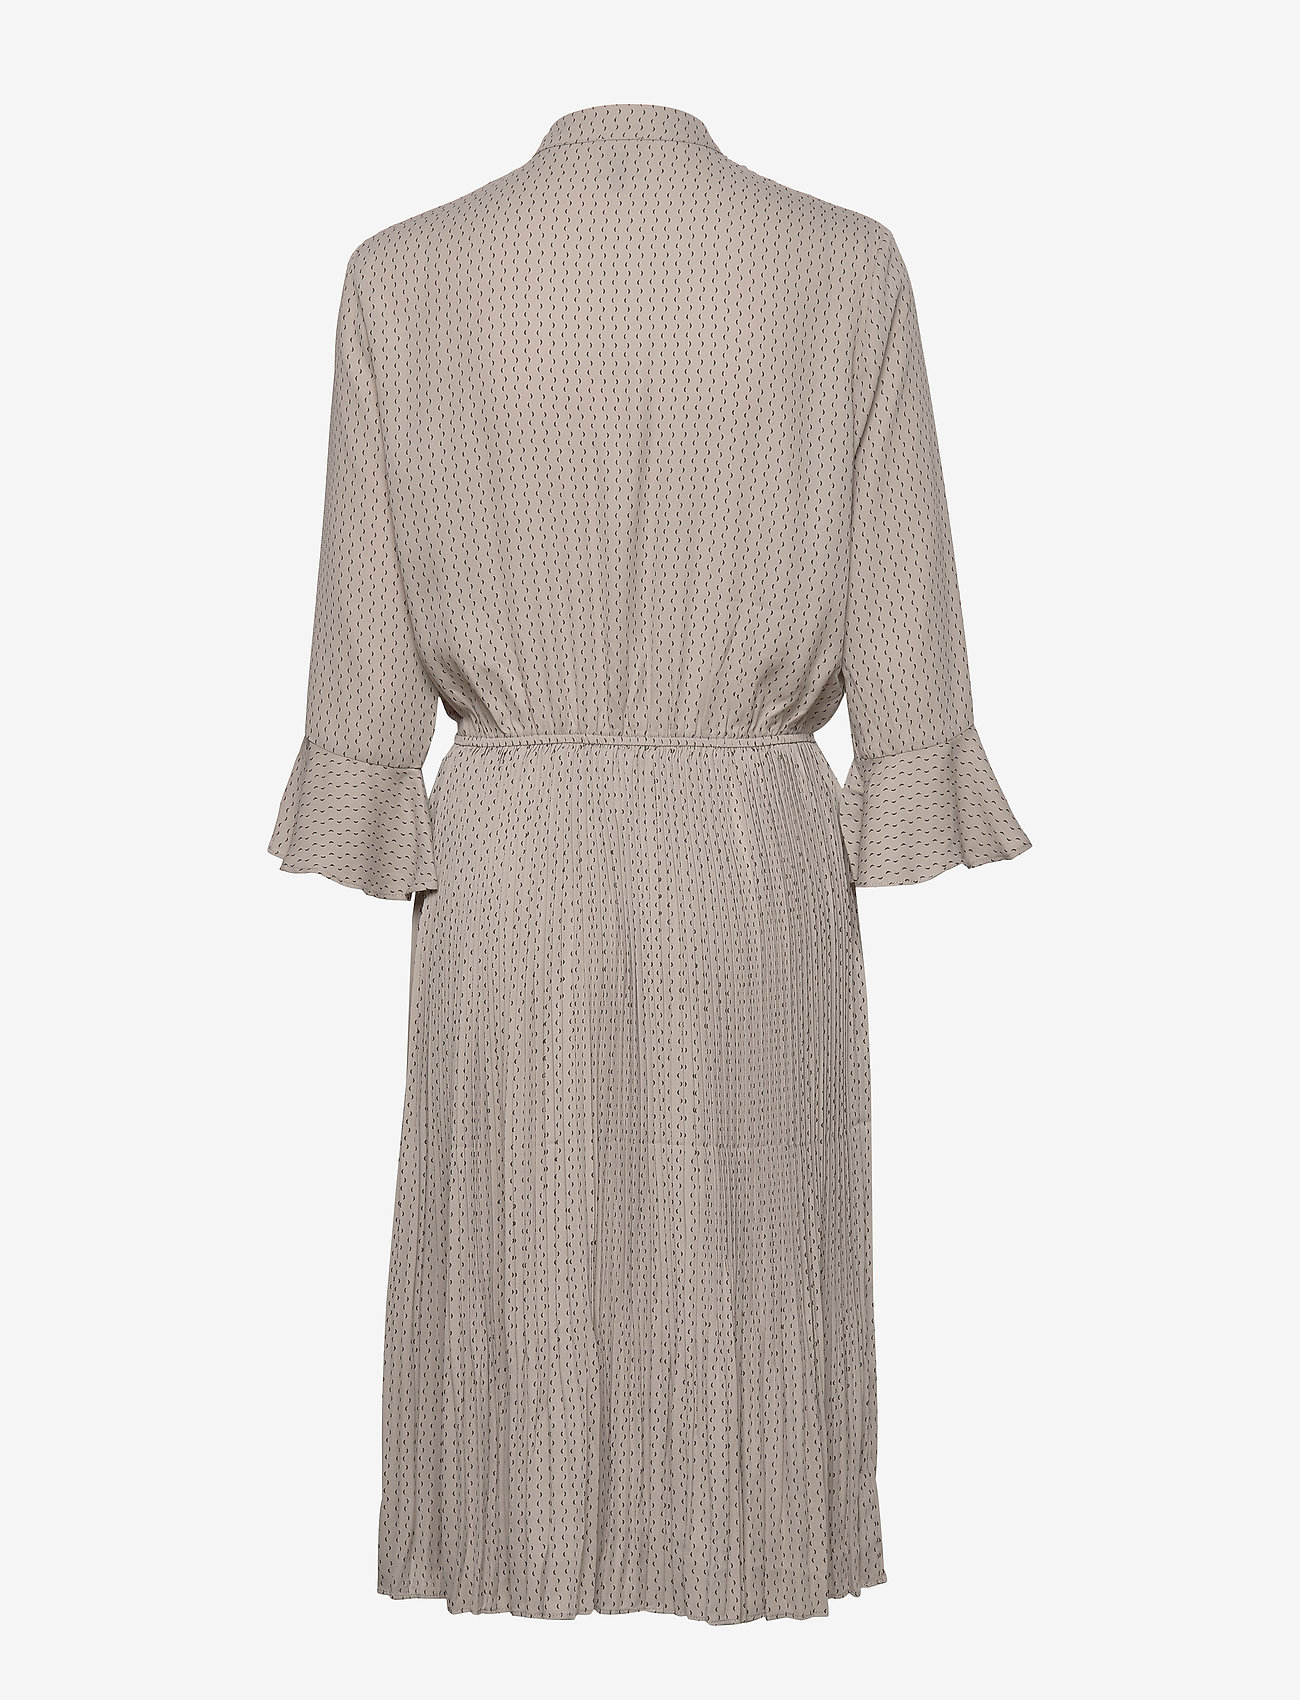 NÜ Denmark - Carrie Dress RECYCLED - robes longeur du midi - grey cigar mix